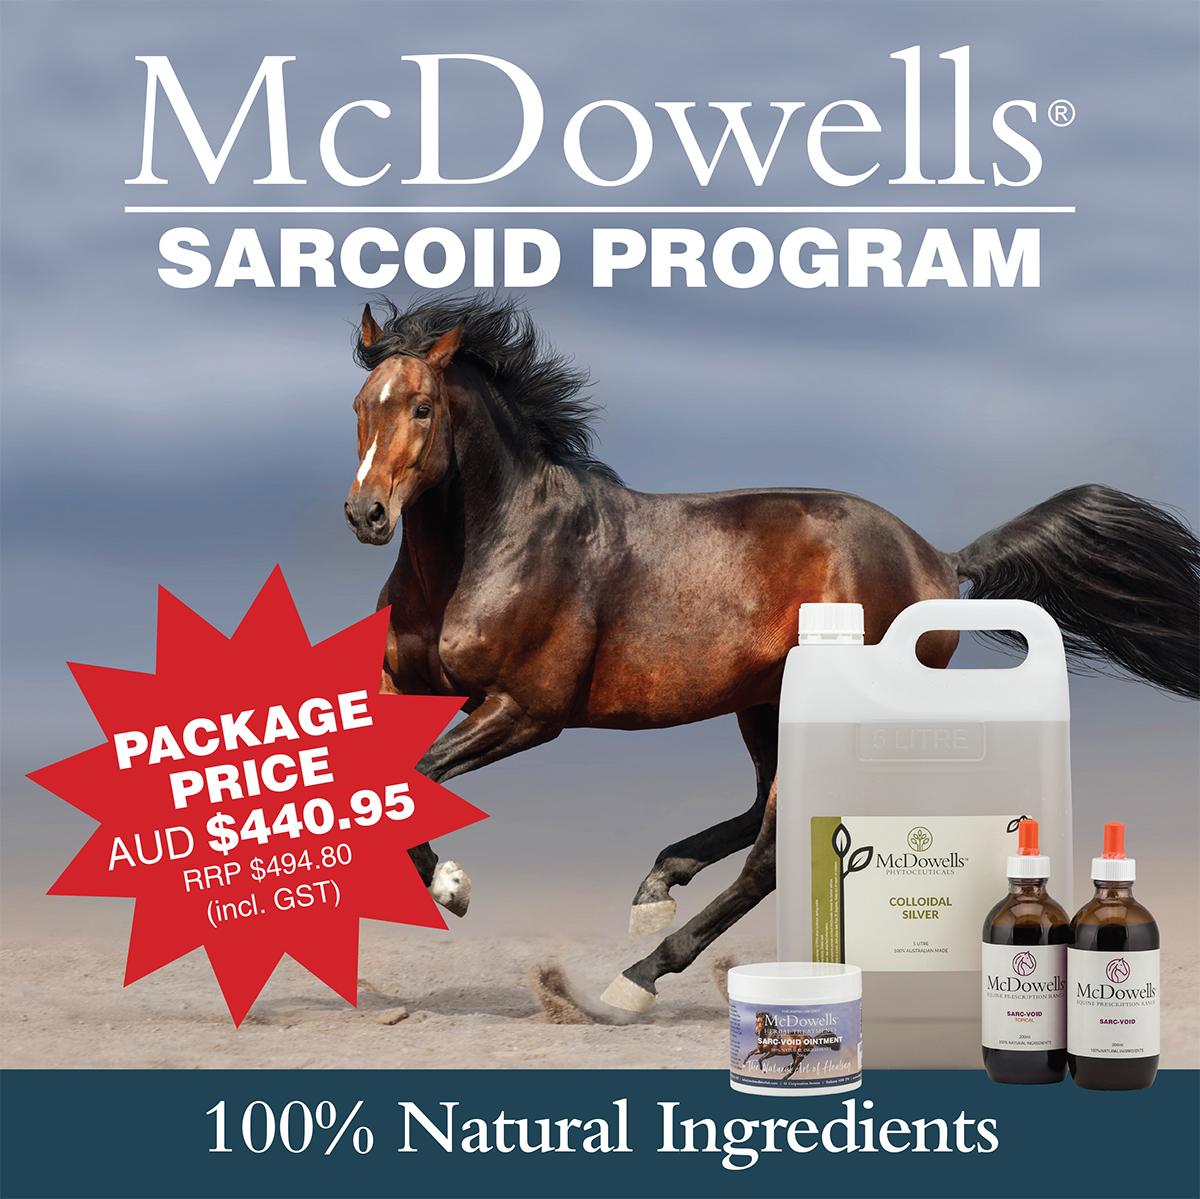 Sarcoid Program